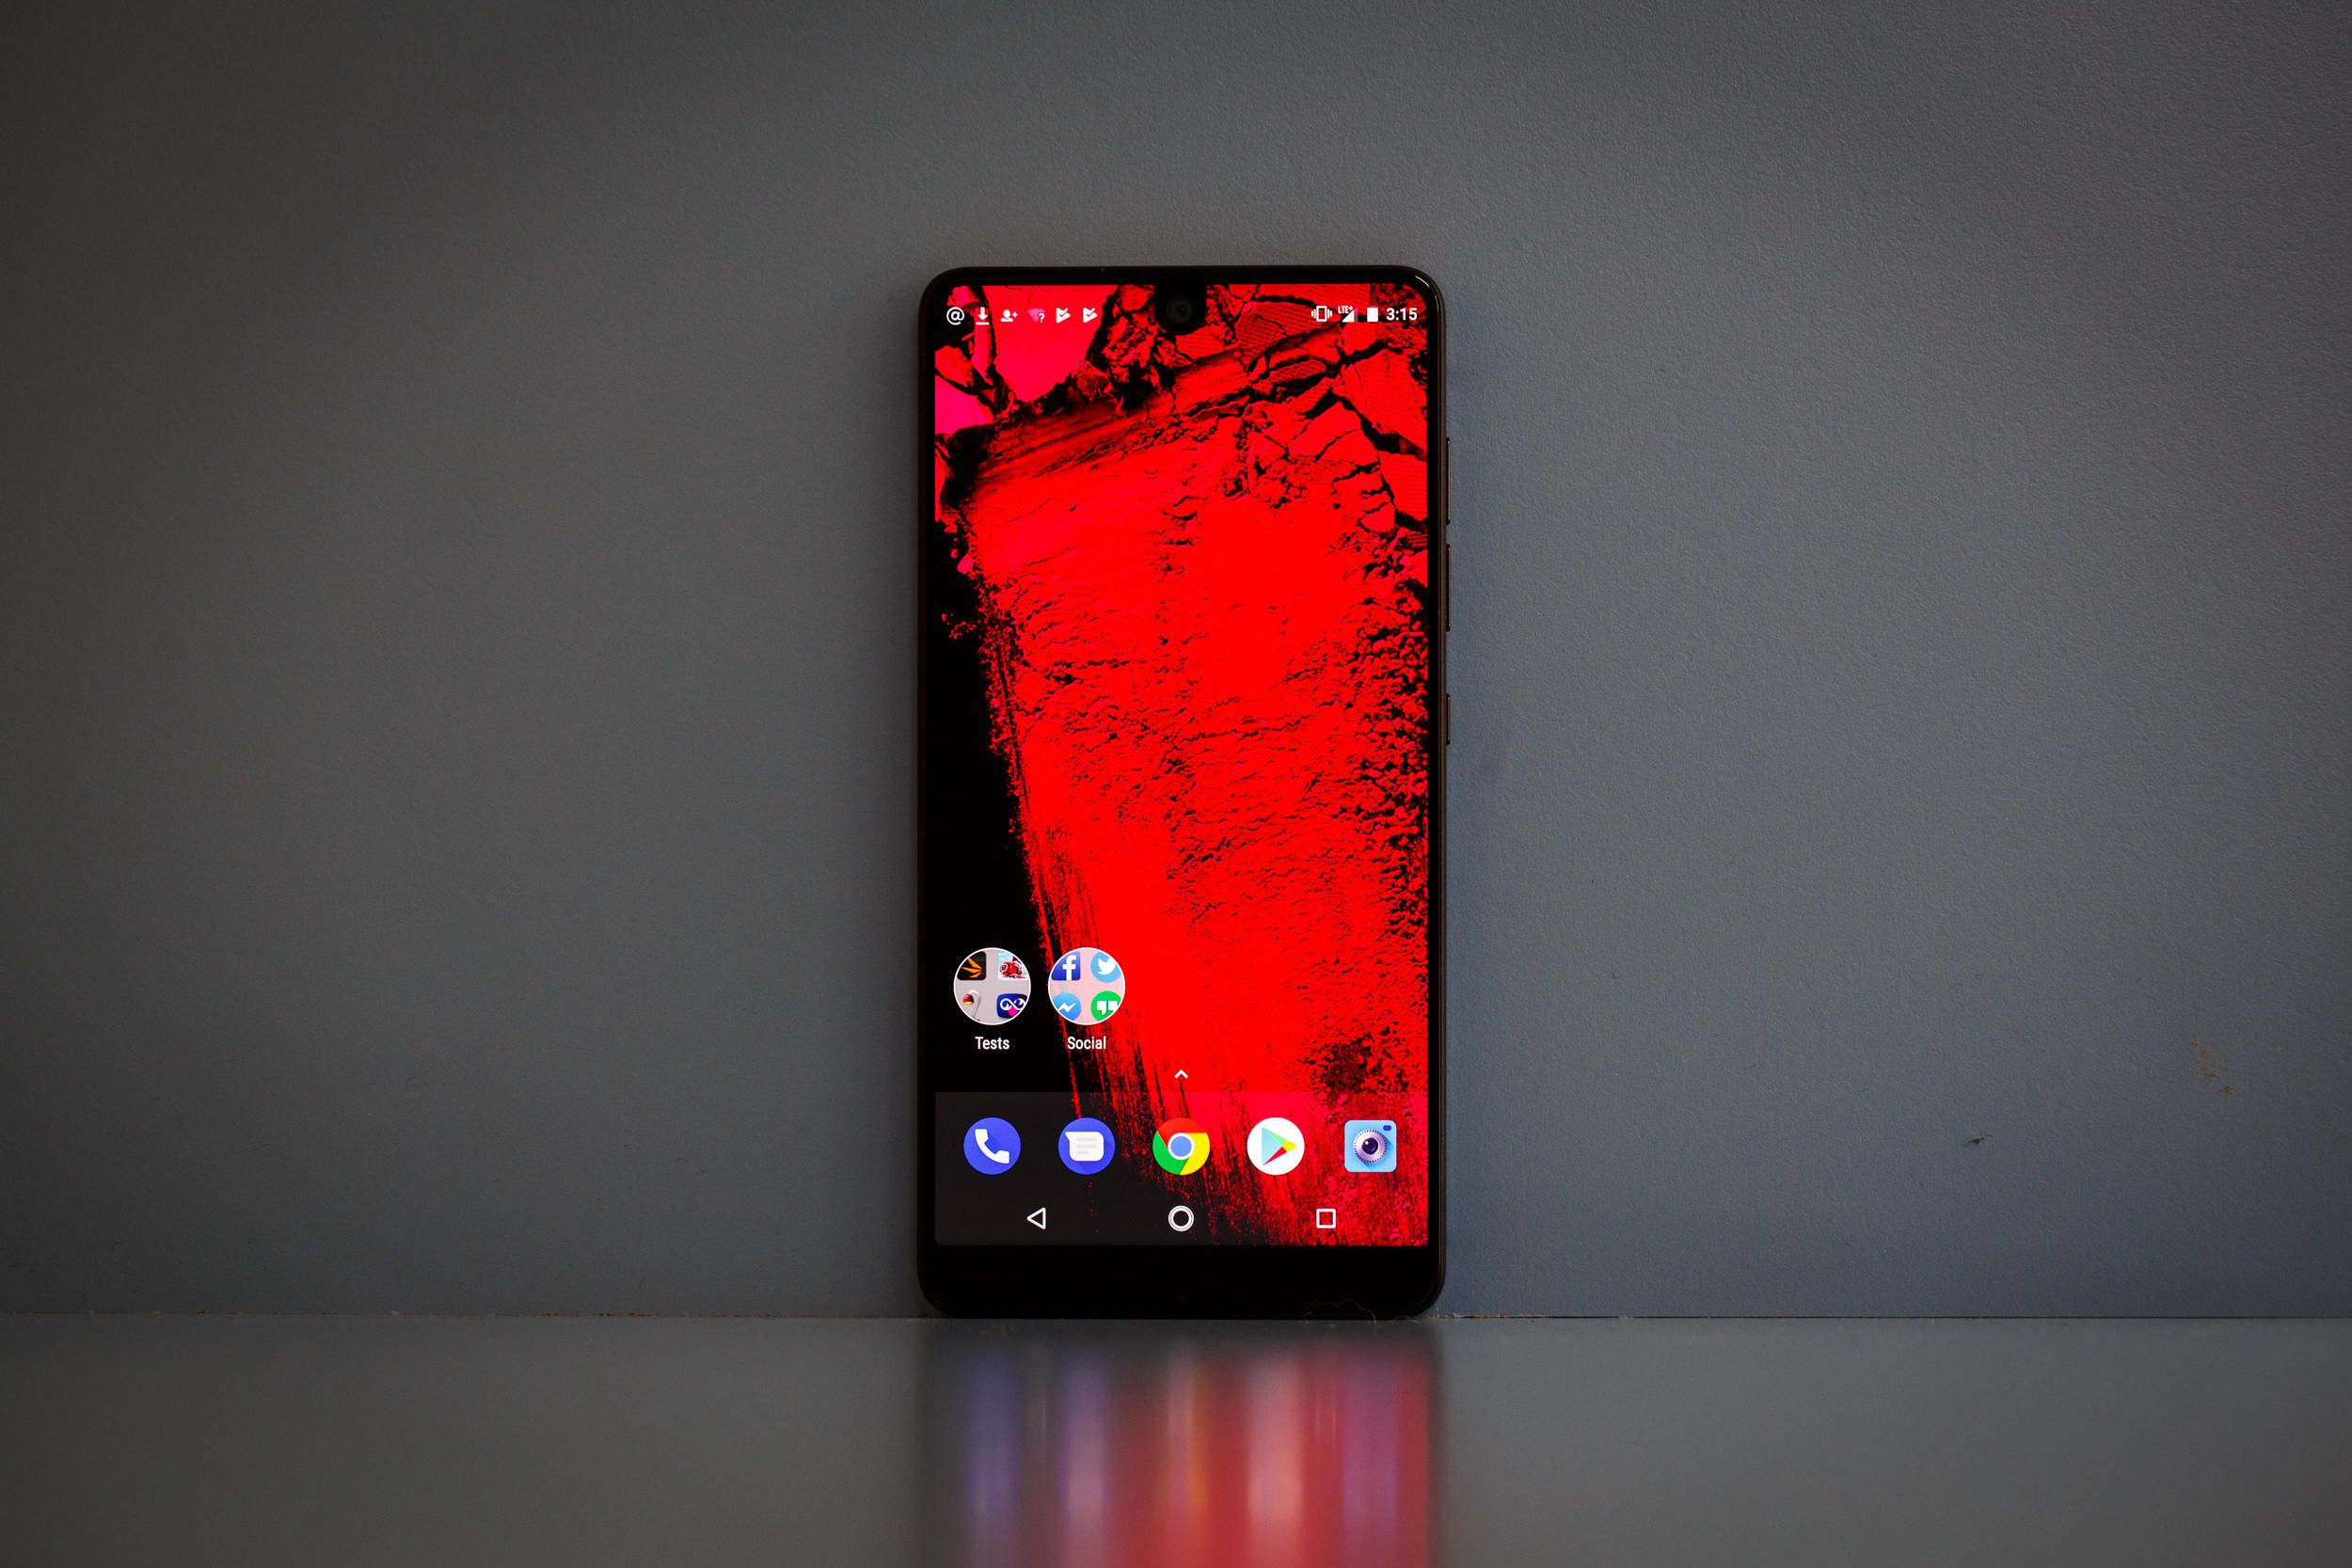 سرانجام فروش اسنشال فون (Essential Phone) آغاز شد